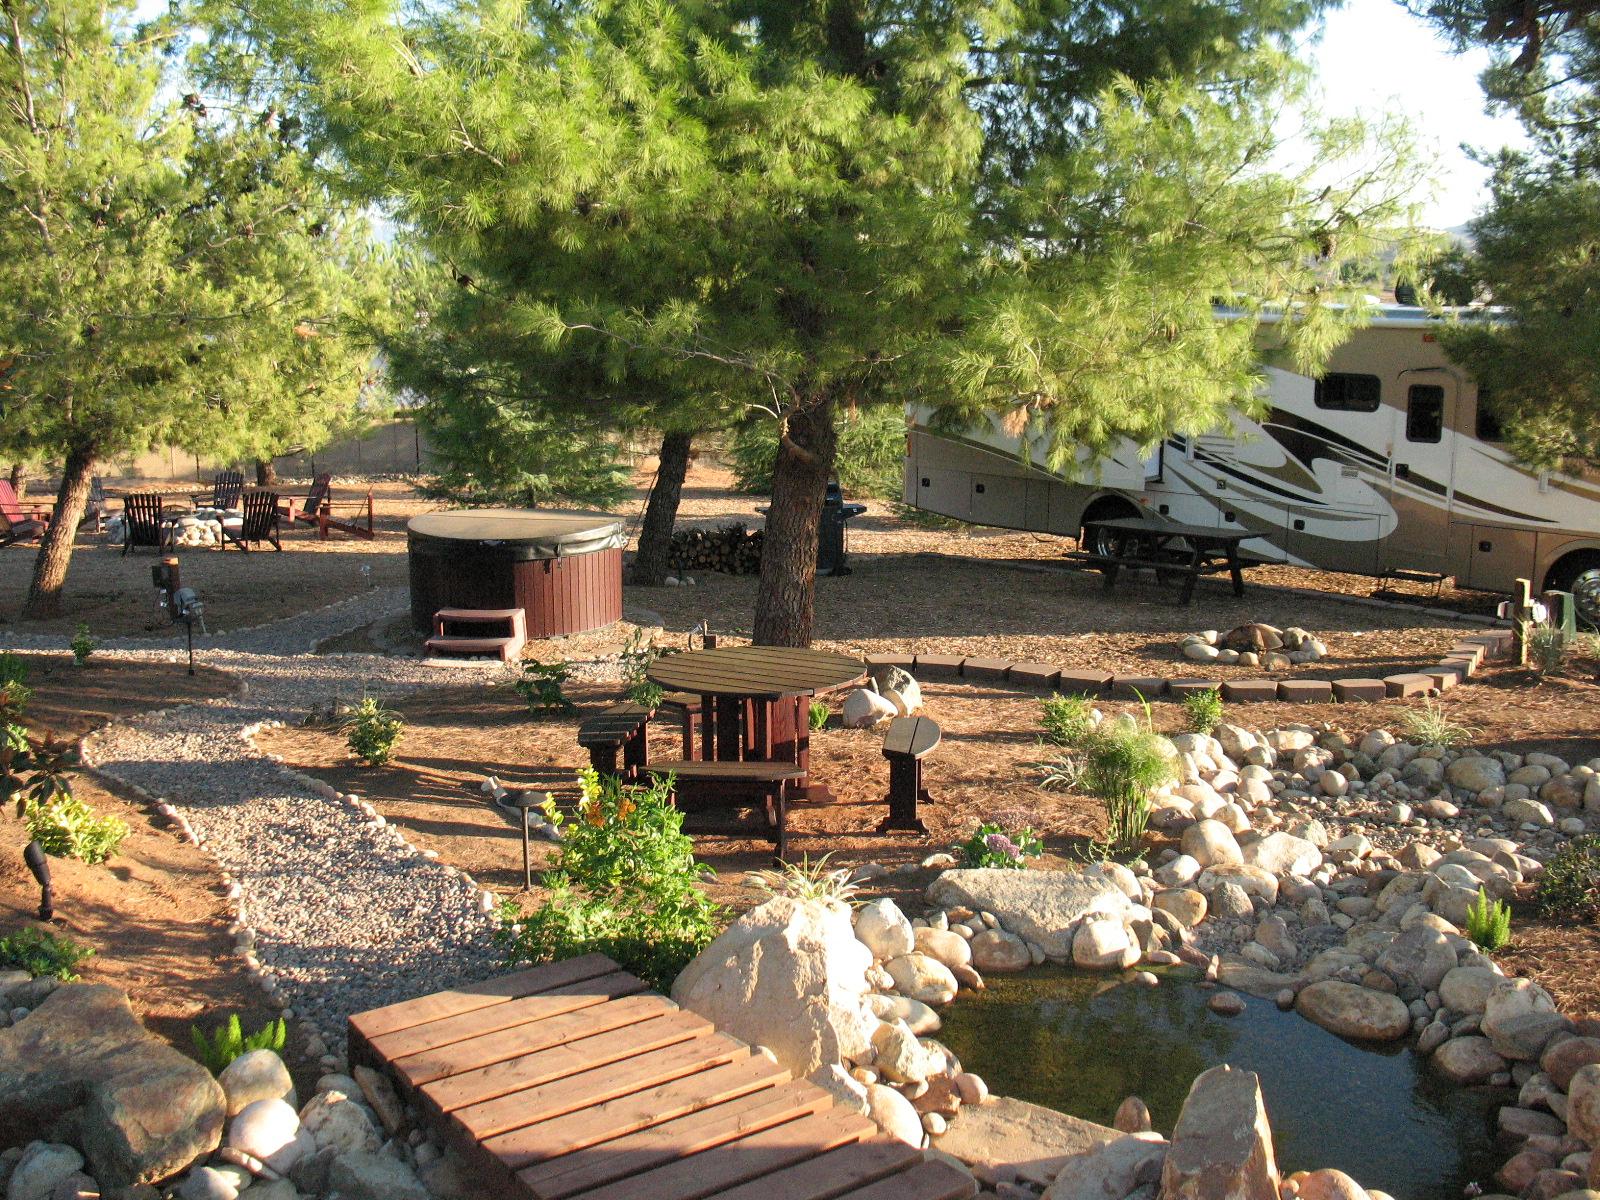 Failla Pines Campground